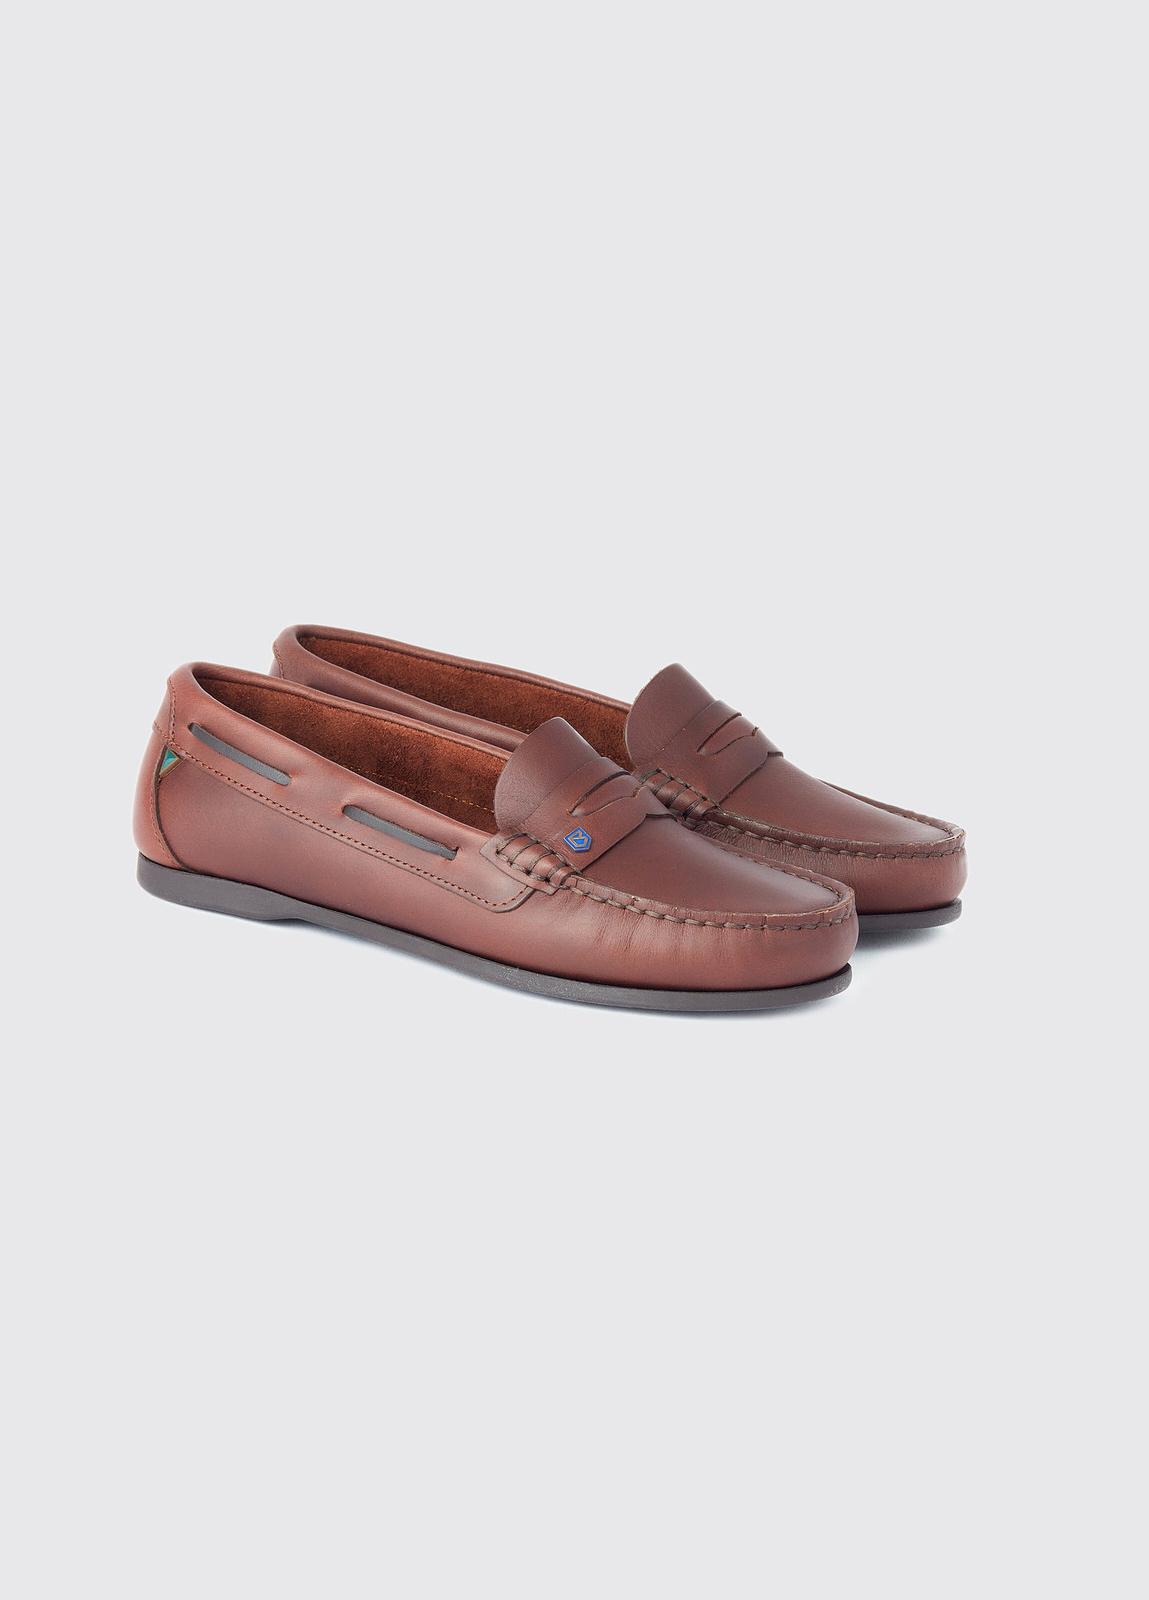 Belize Deck Shoe - Mahogany